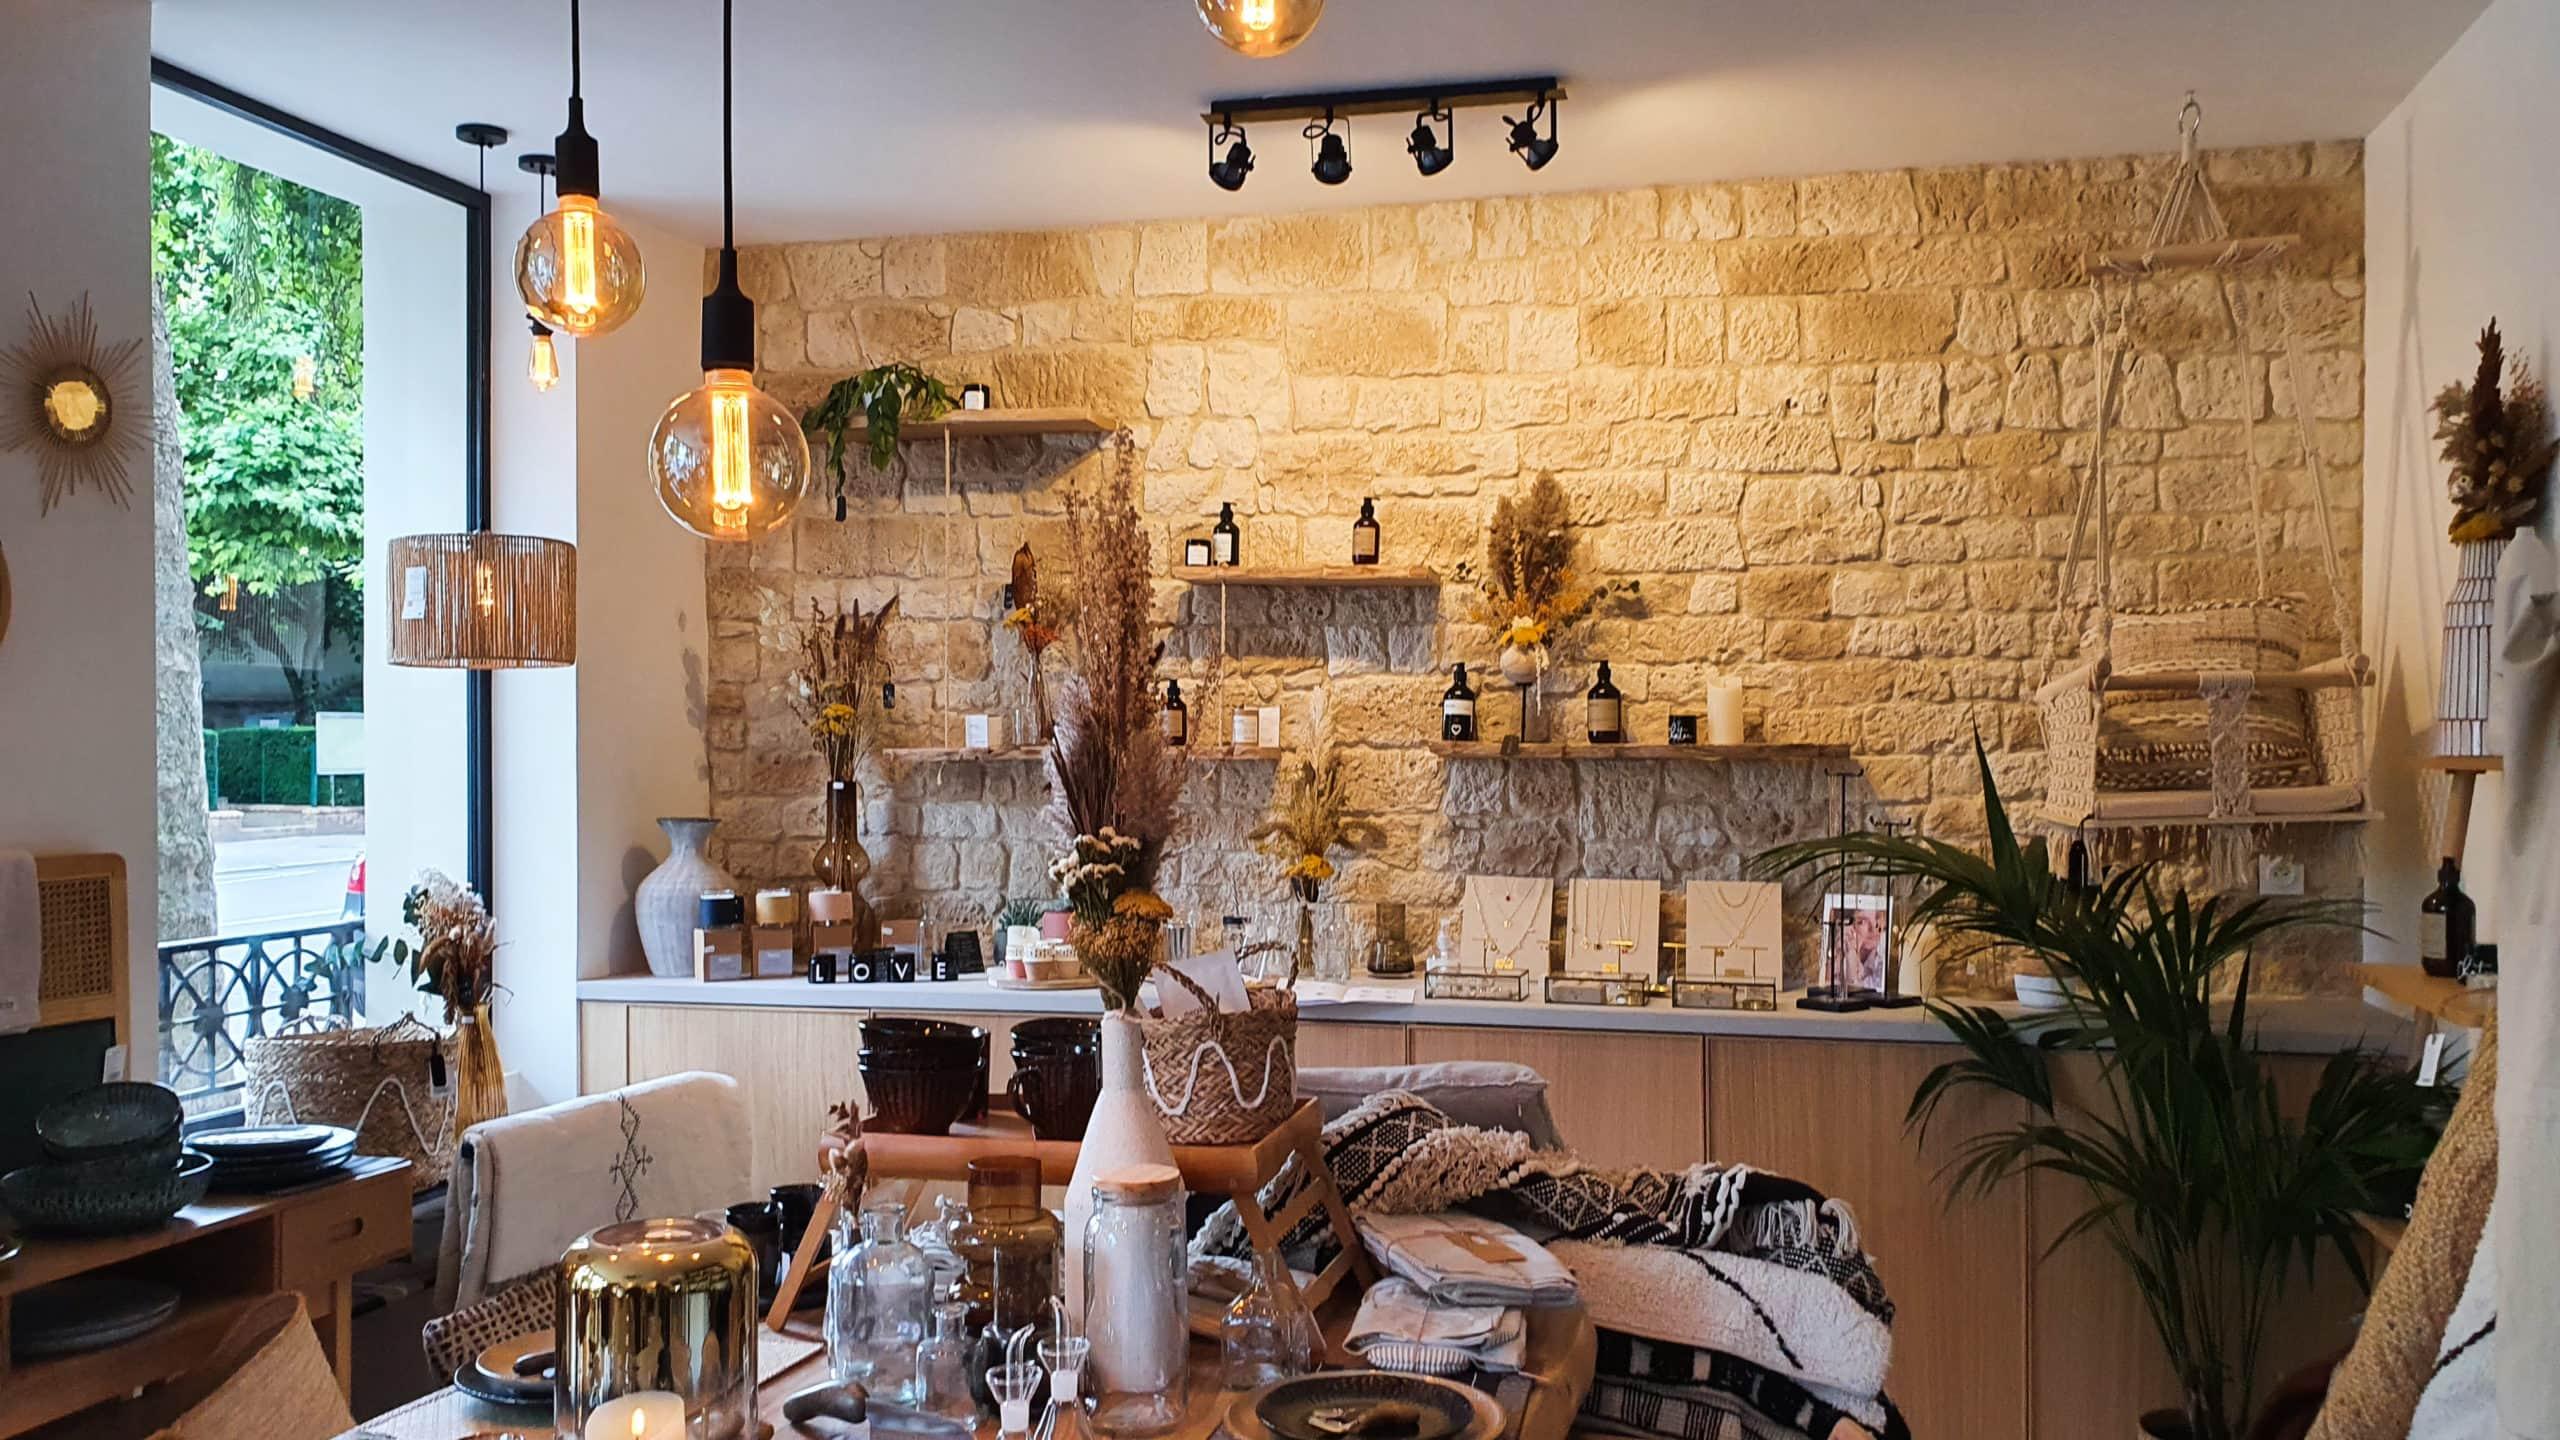 Atelier NYOOD - inside - La Garenne-Colombes